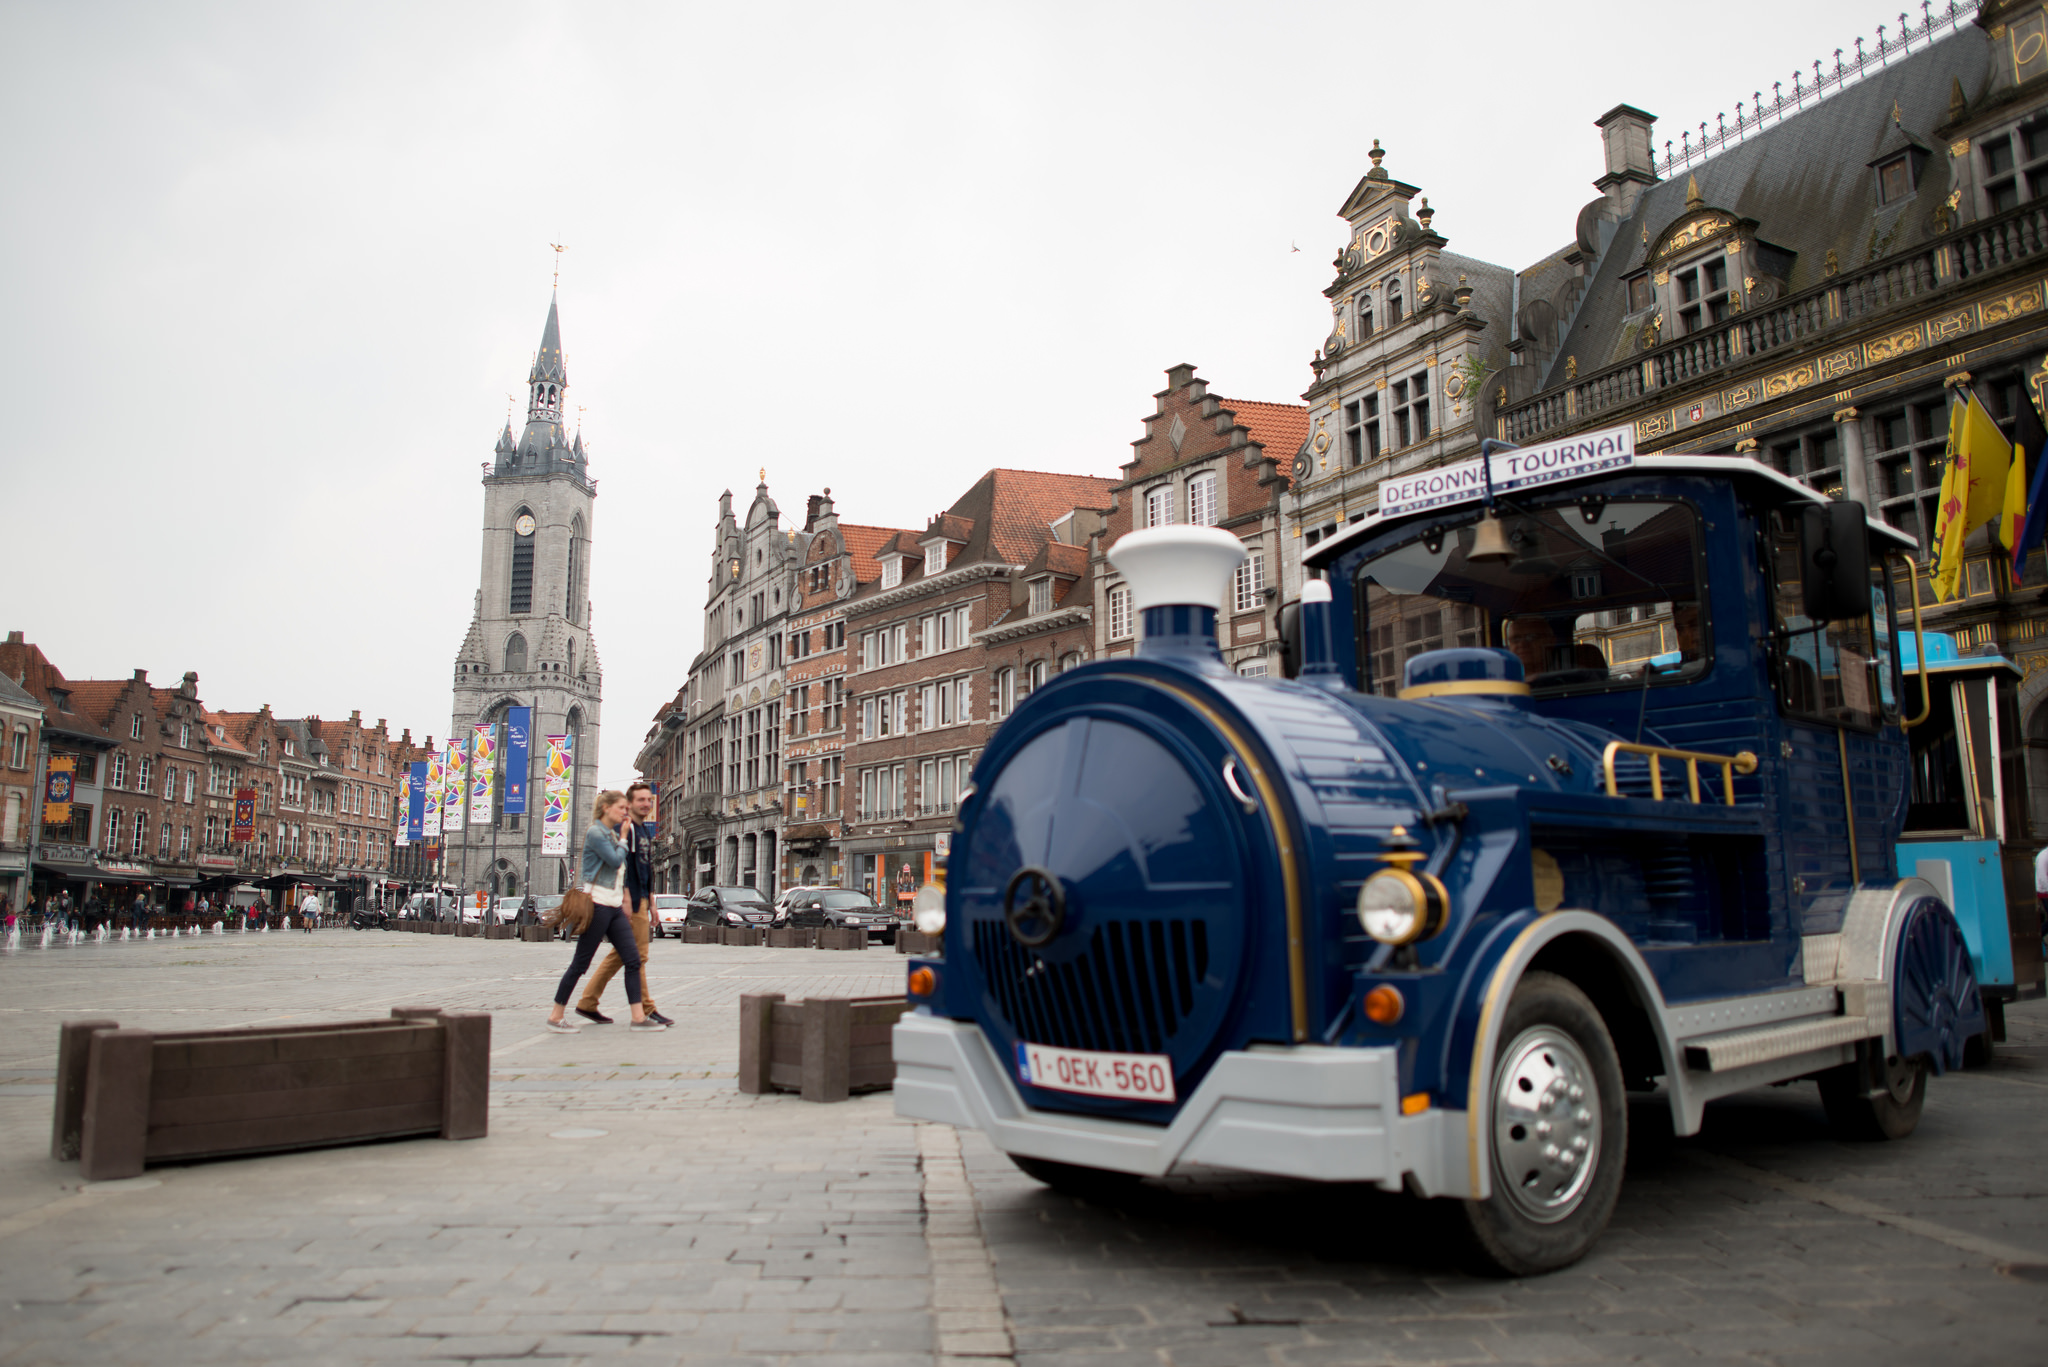 Balade en petit train à Tournai